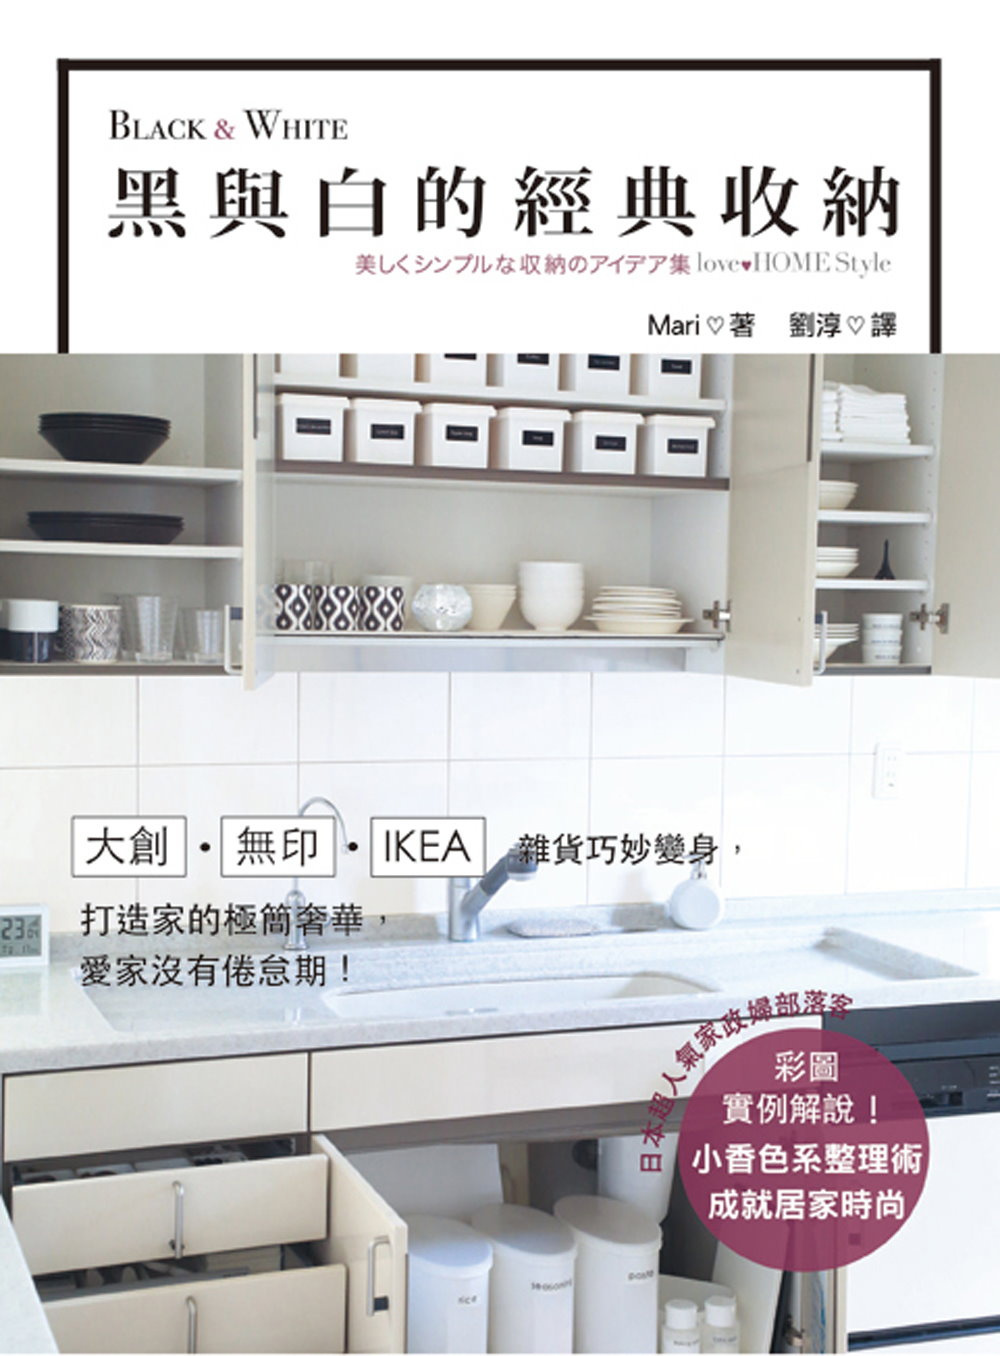 Black&White 黑與白的經典收納:大創、無印、IKEA雜貨巧妙變身,打造家的極簡奢華,愛家沒有倦怠期!